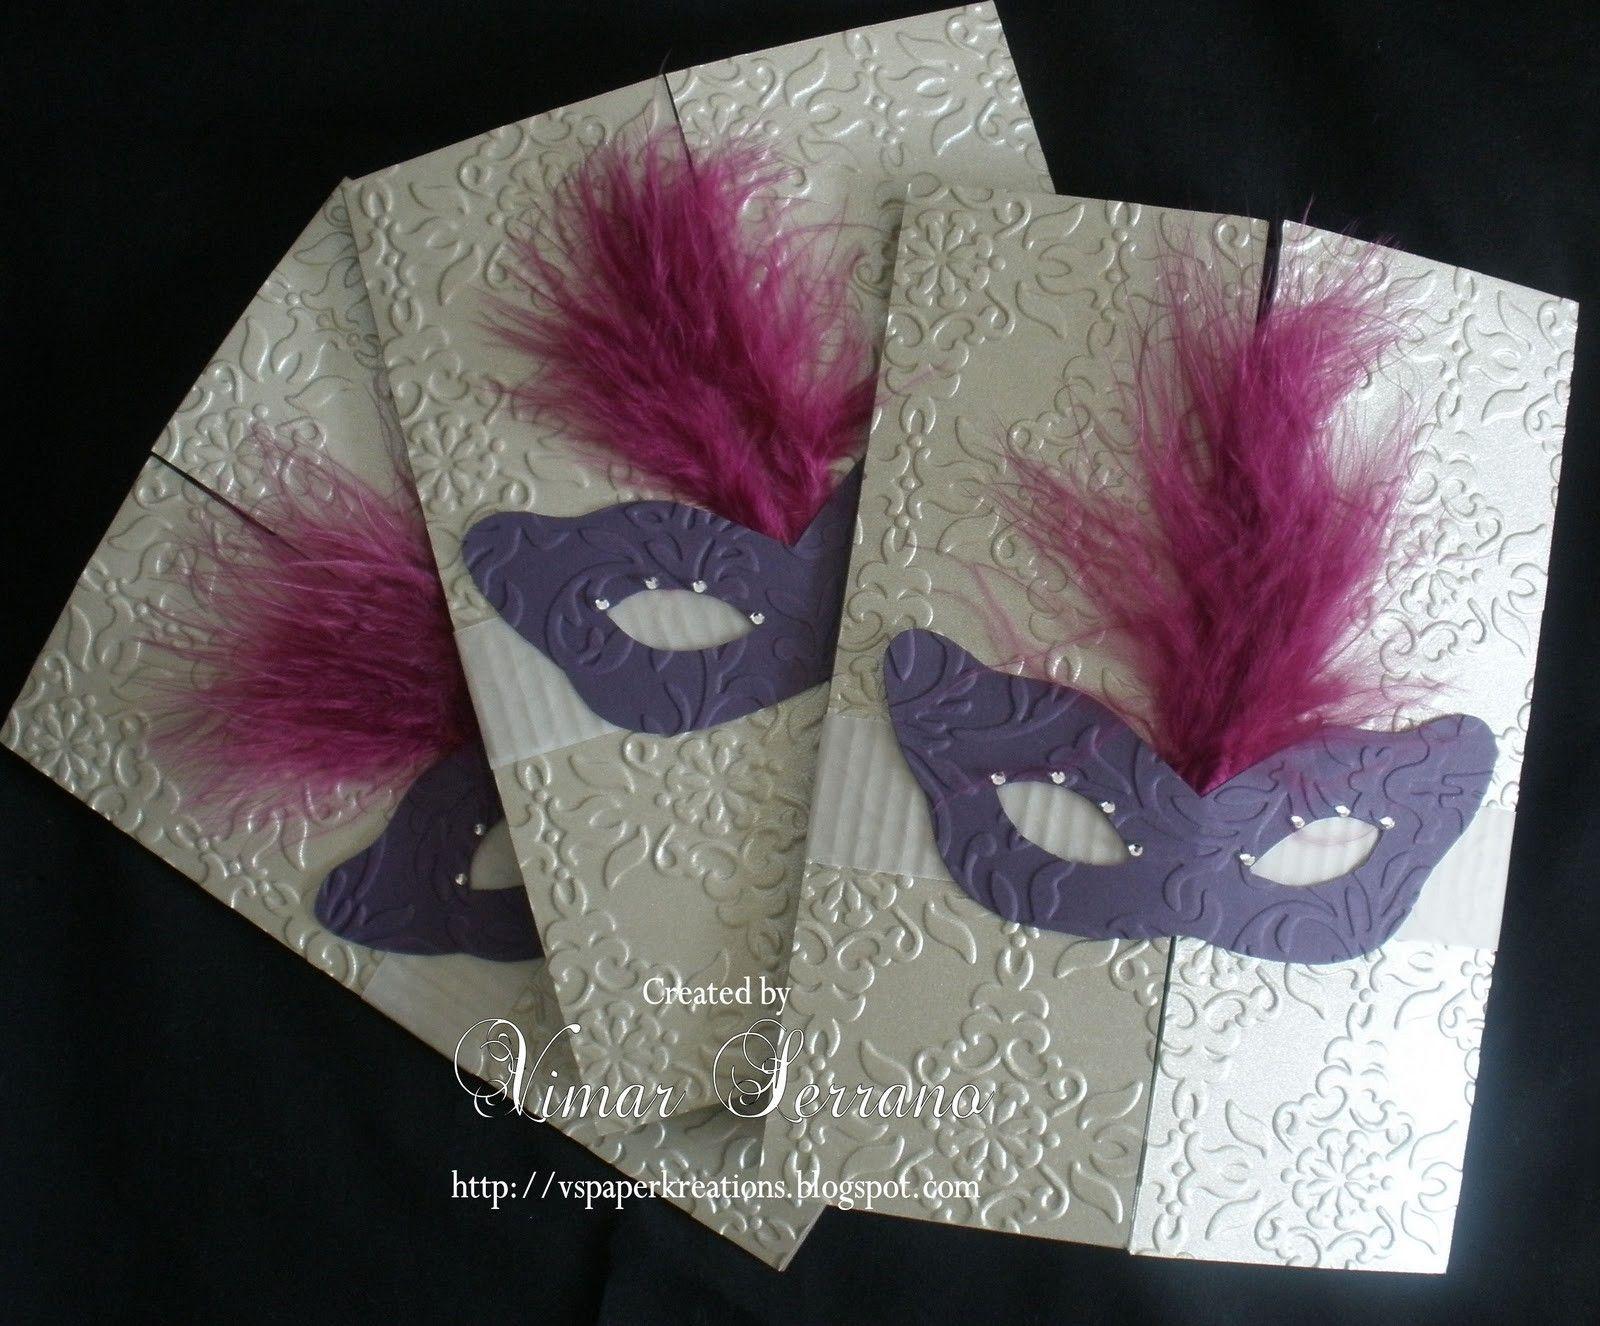 Masquerade Party Invitations Masquerade Party Invitations Free